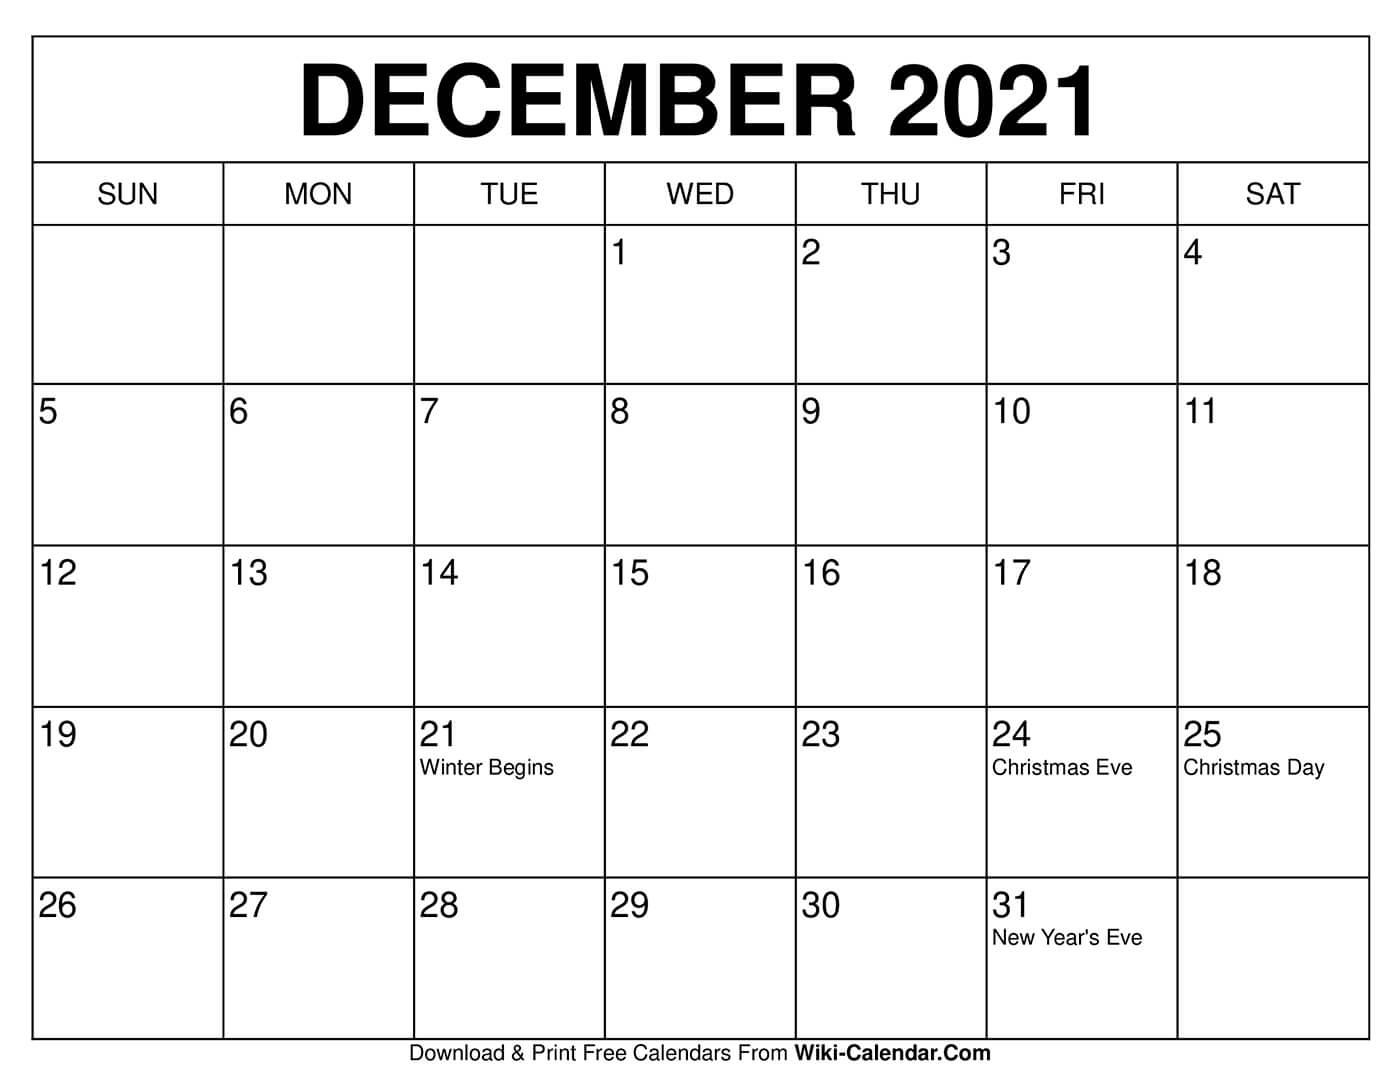 Take Planner December 2021 - Best Calendar Example